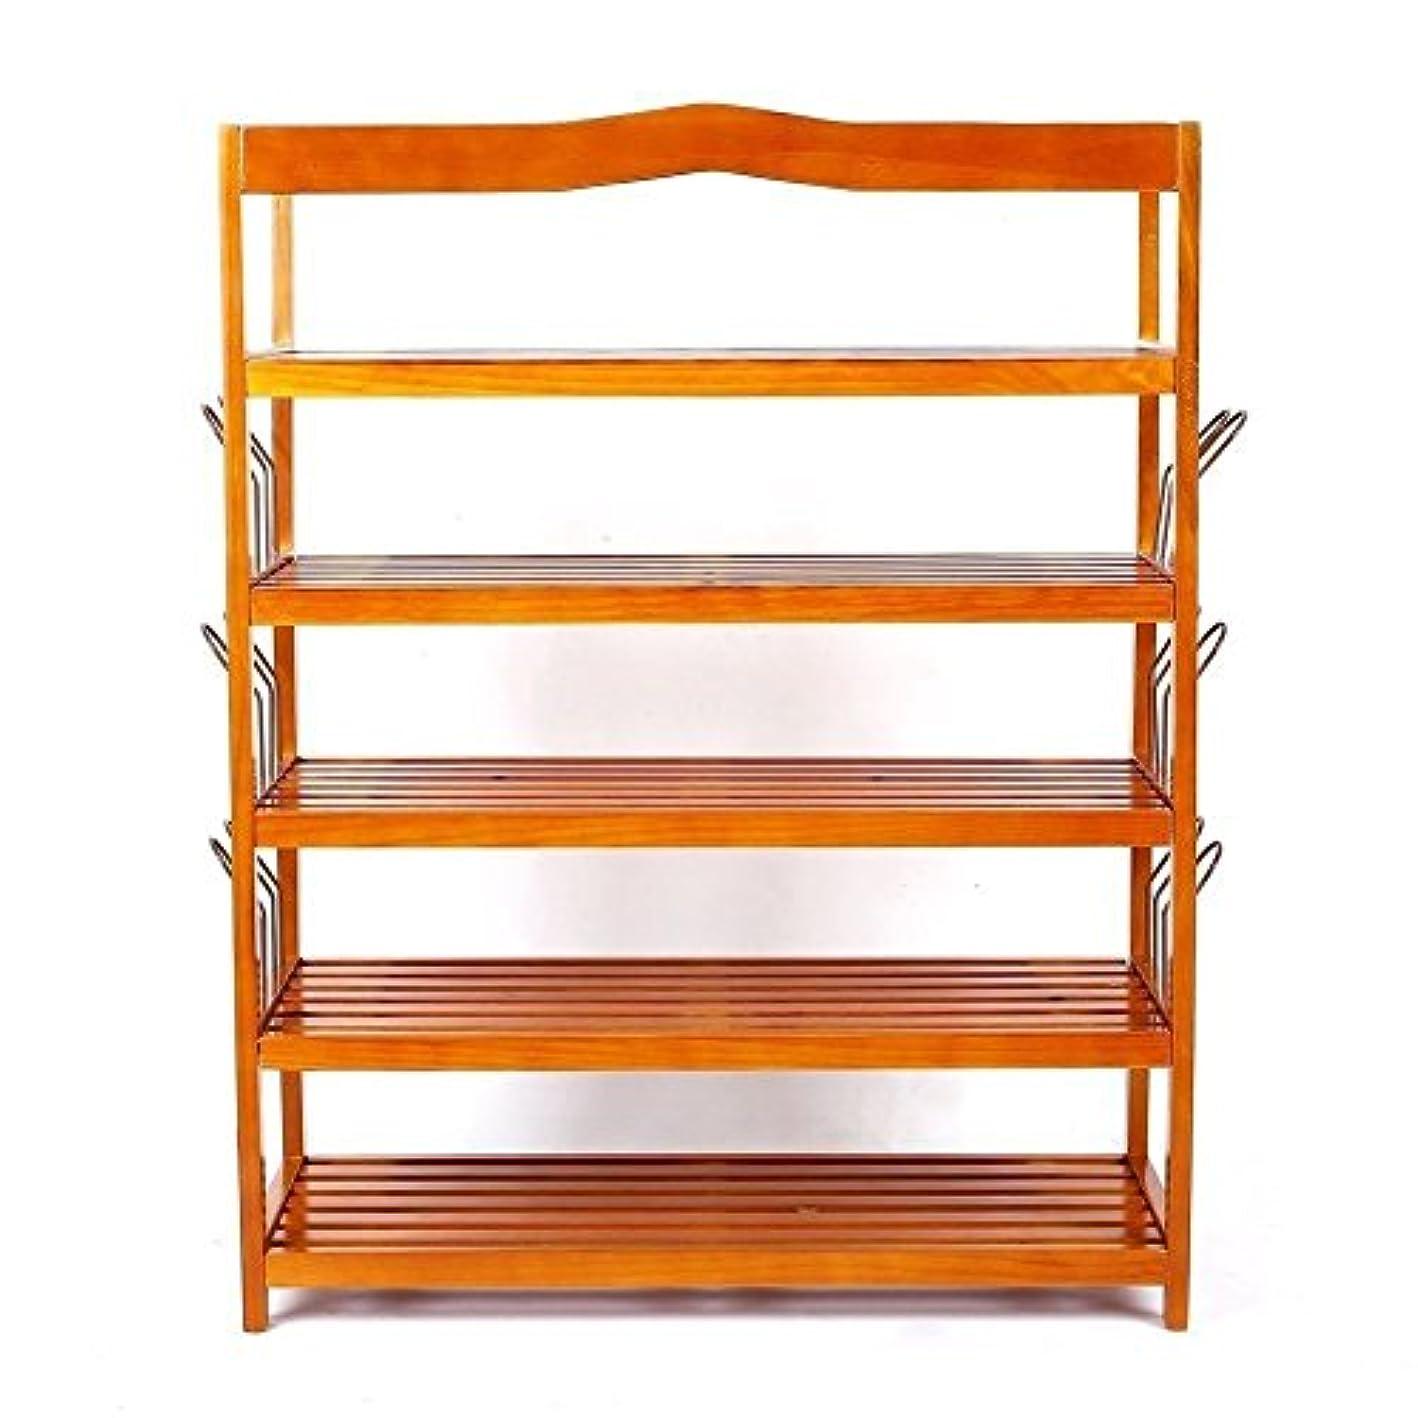 TimmyHouse Shoe Rack Organizer 5 Tiers Storage Shelf Wood Home Closet Dorm Room Entryway